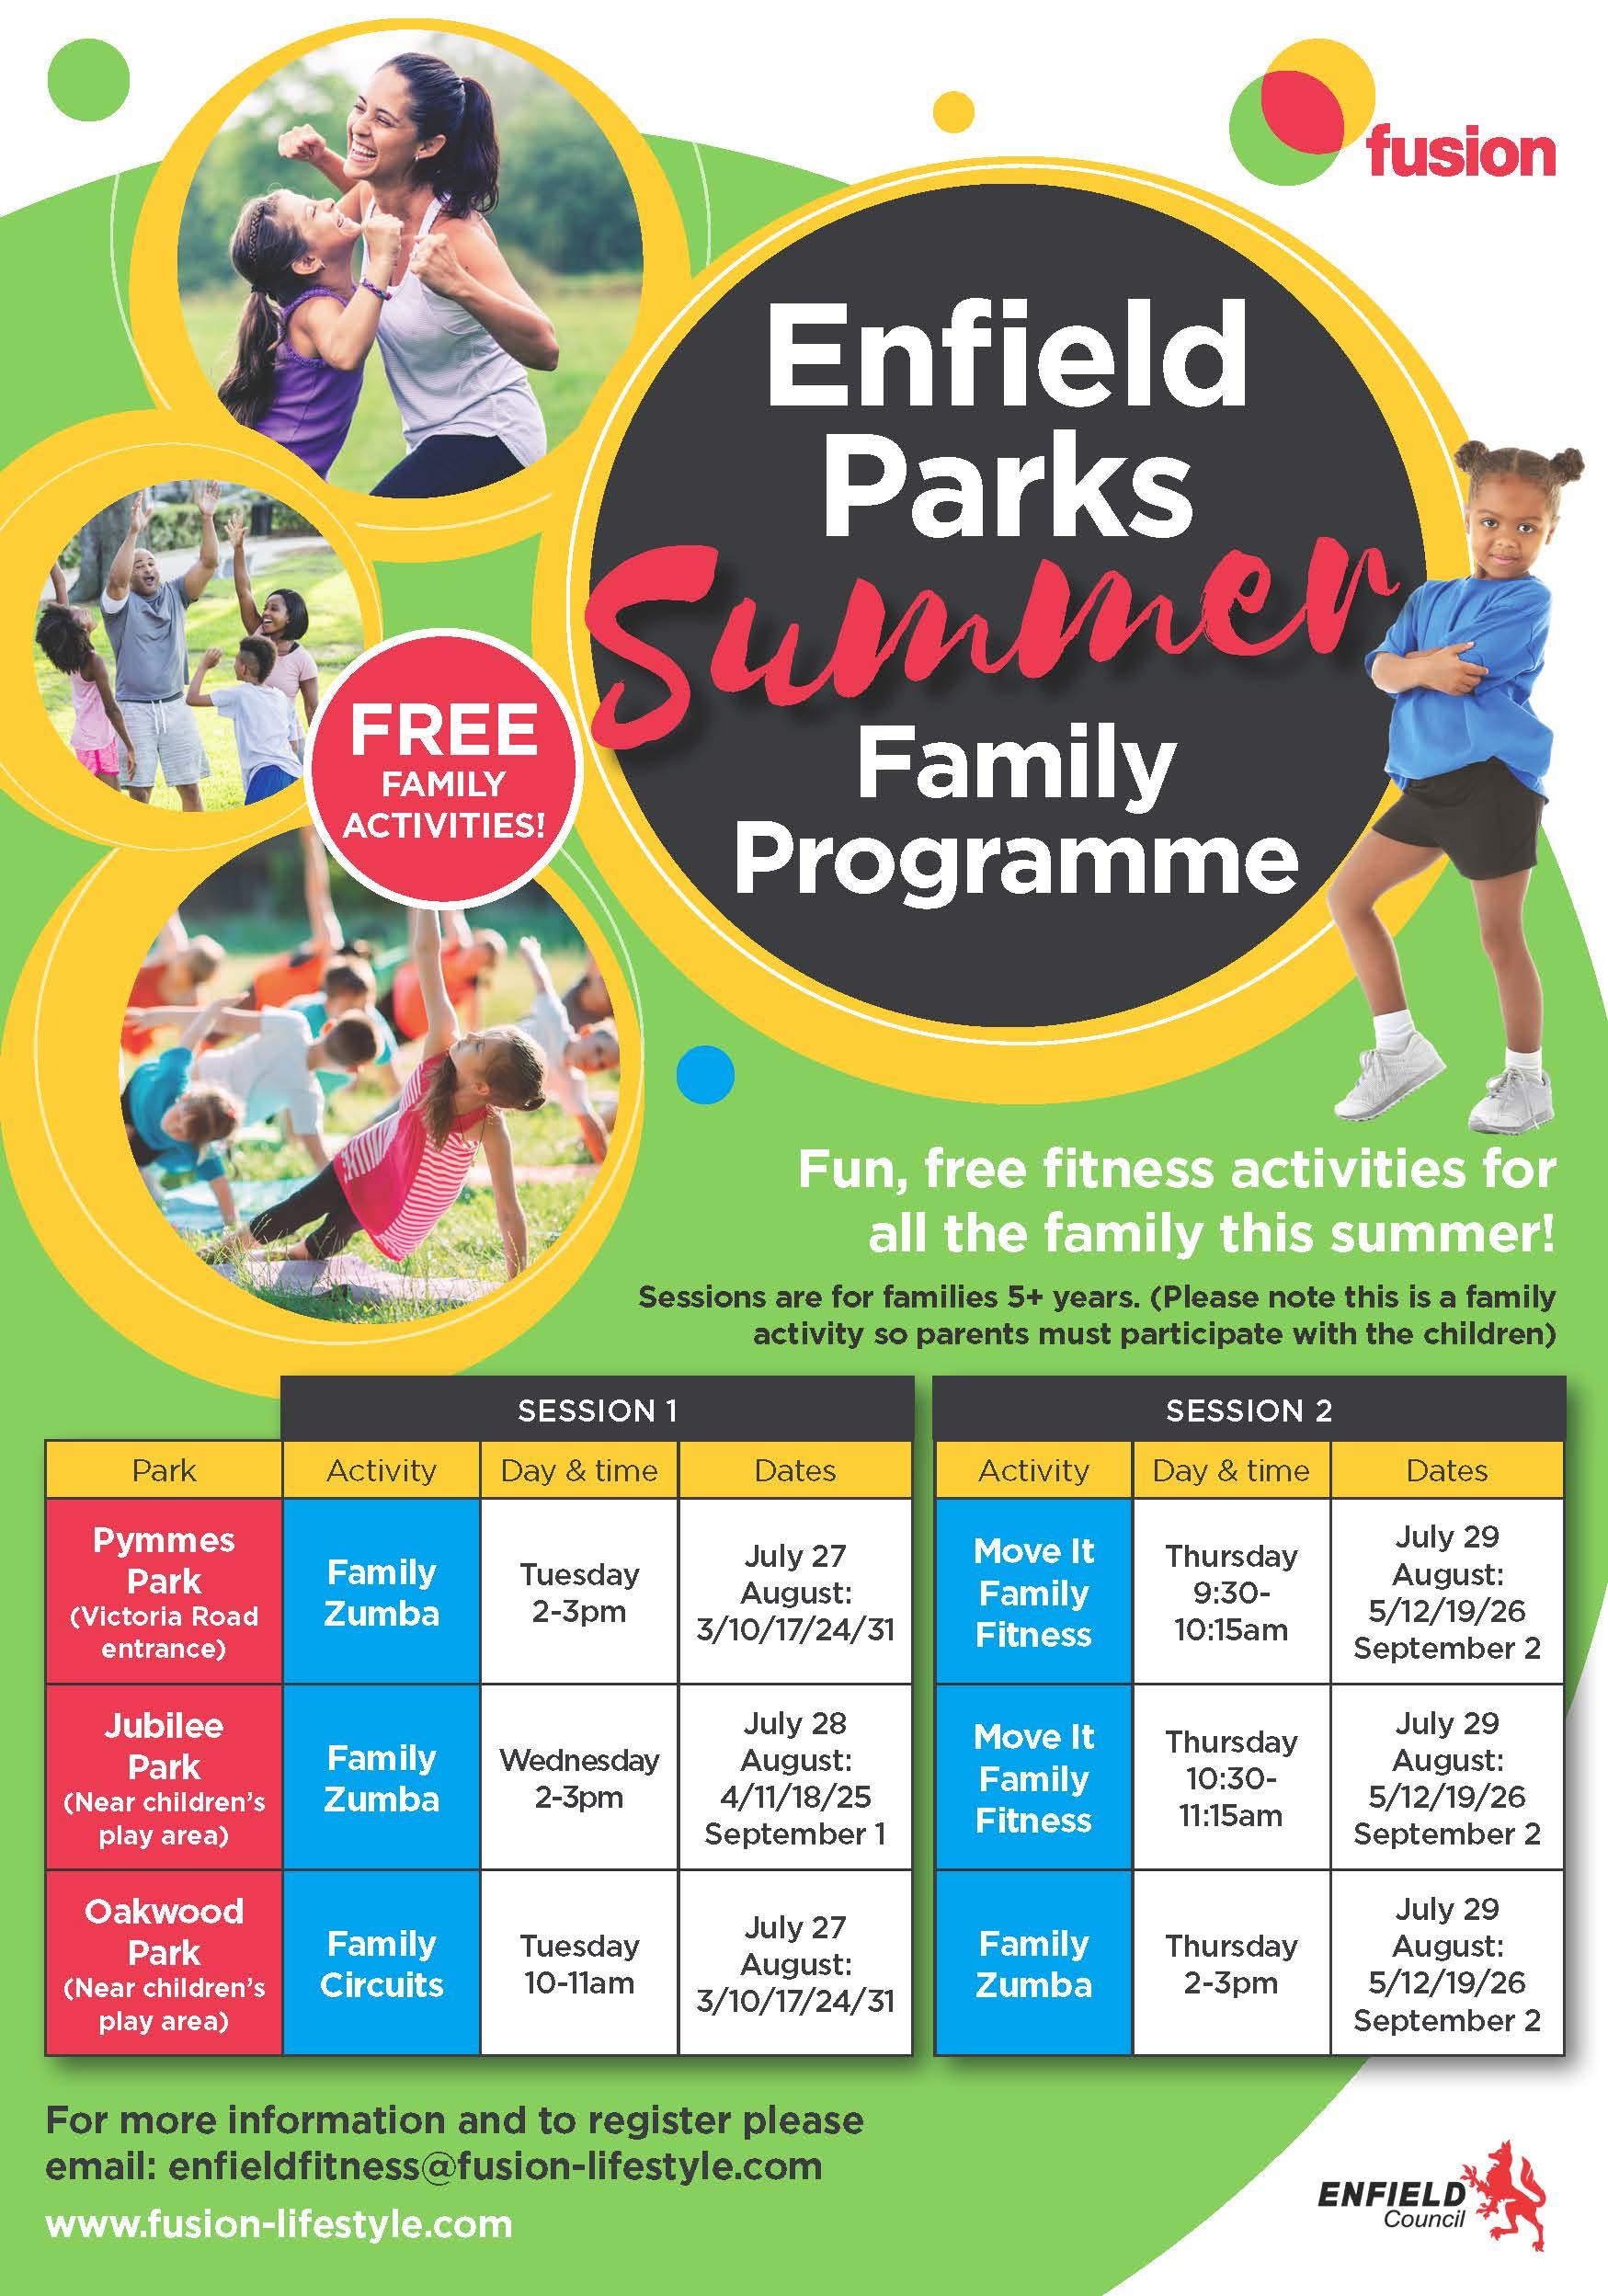 Family Parks Programme